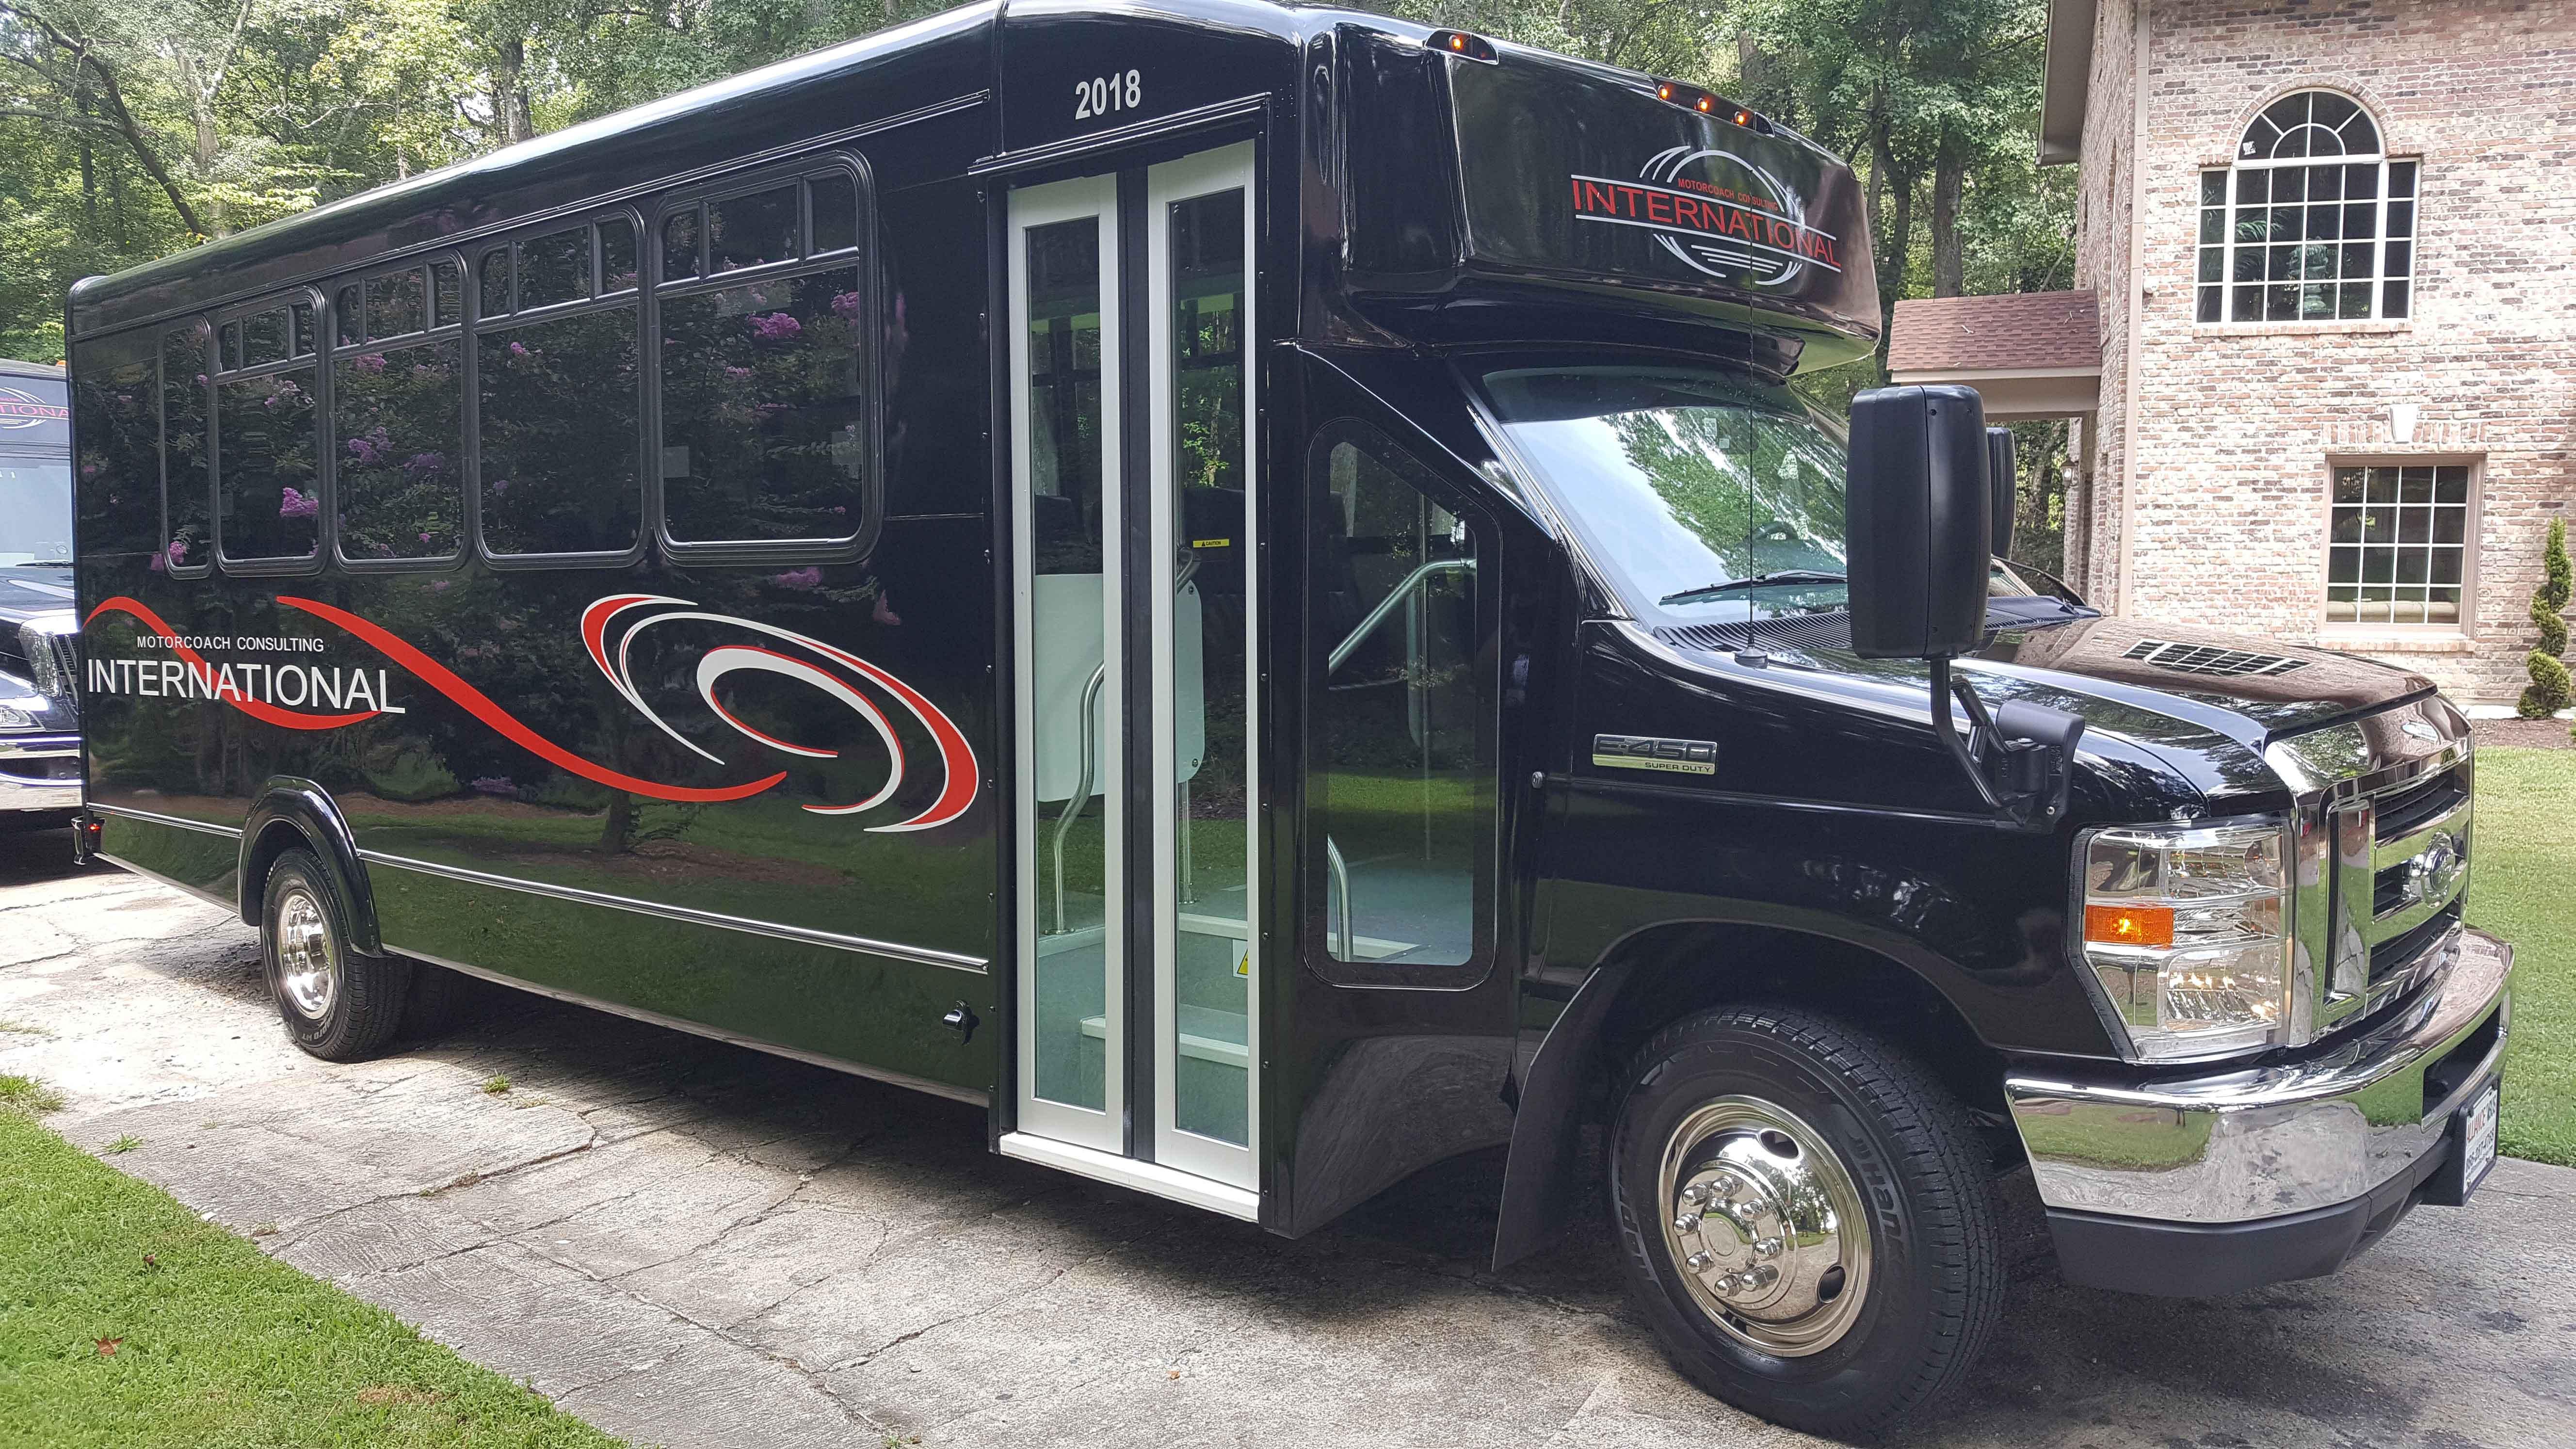 Charter Bus Company in Atlanta, GA - Mini Buses, Luxury Seats